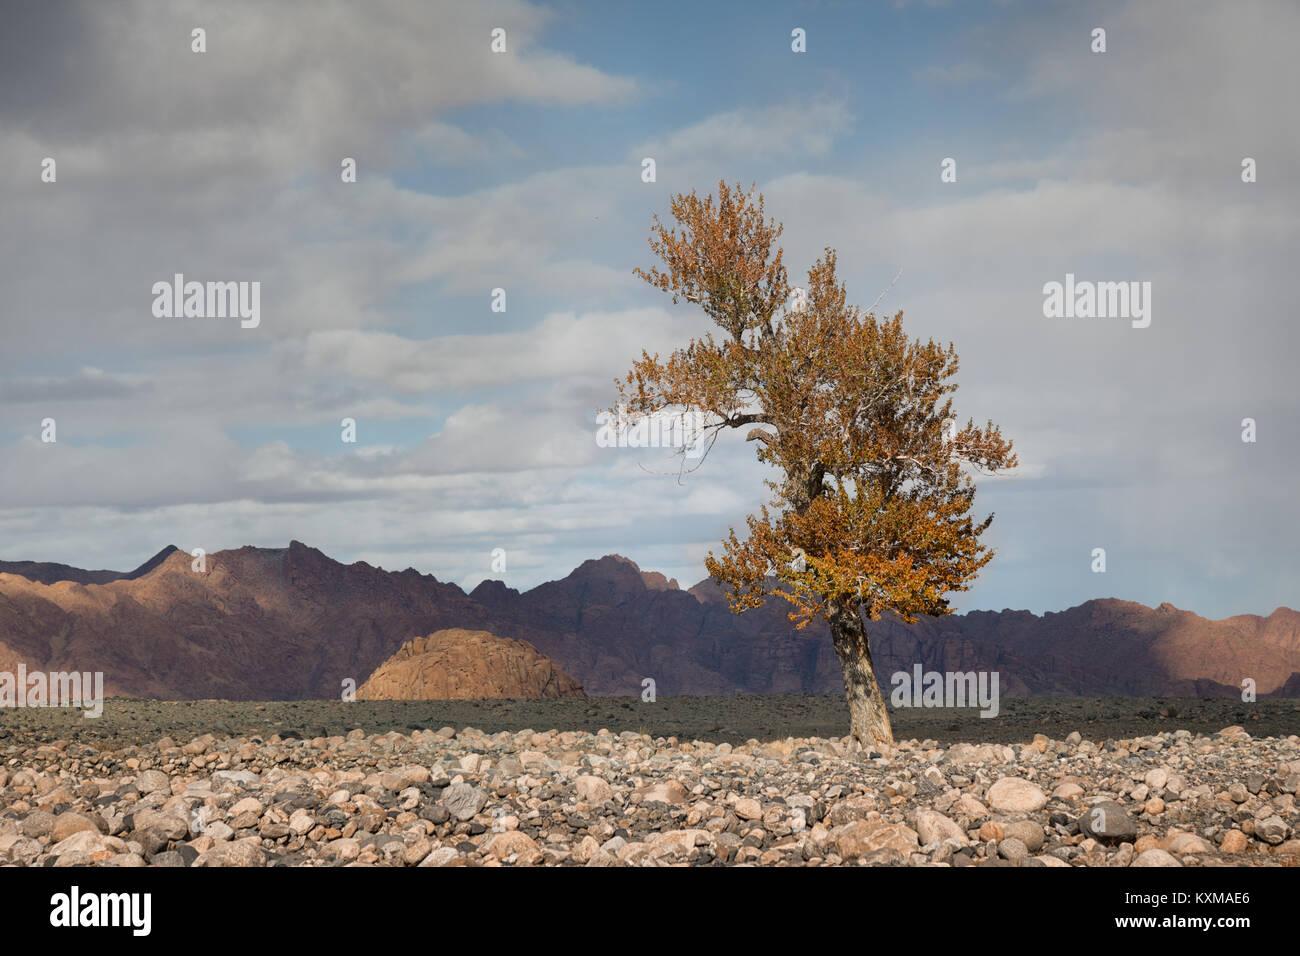 Mongolia yellow leafs tree fall landscape river bank - Stock Image